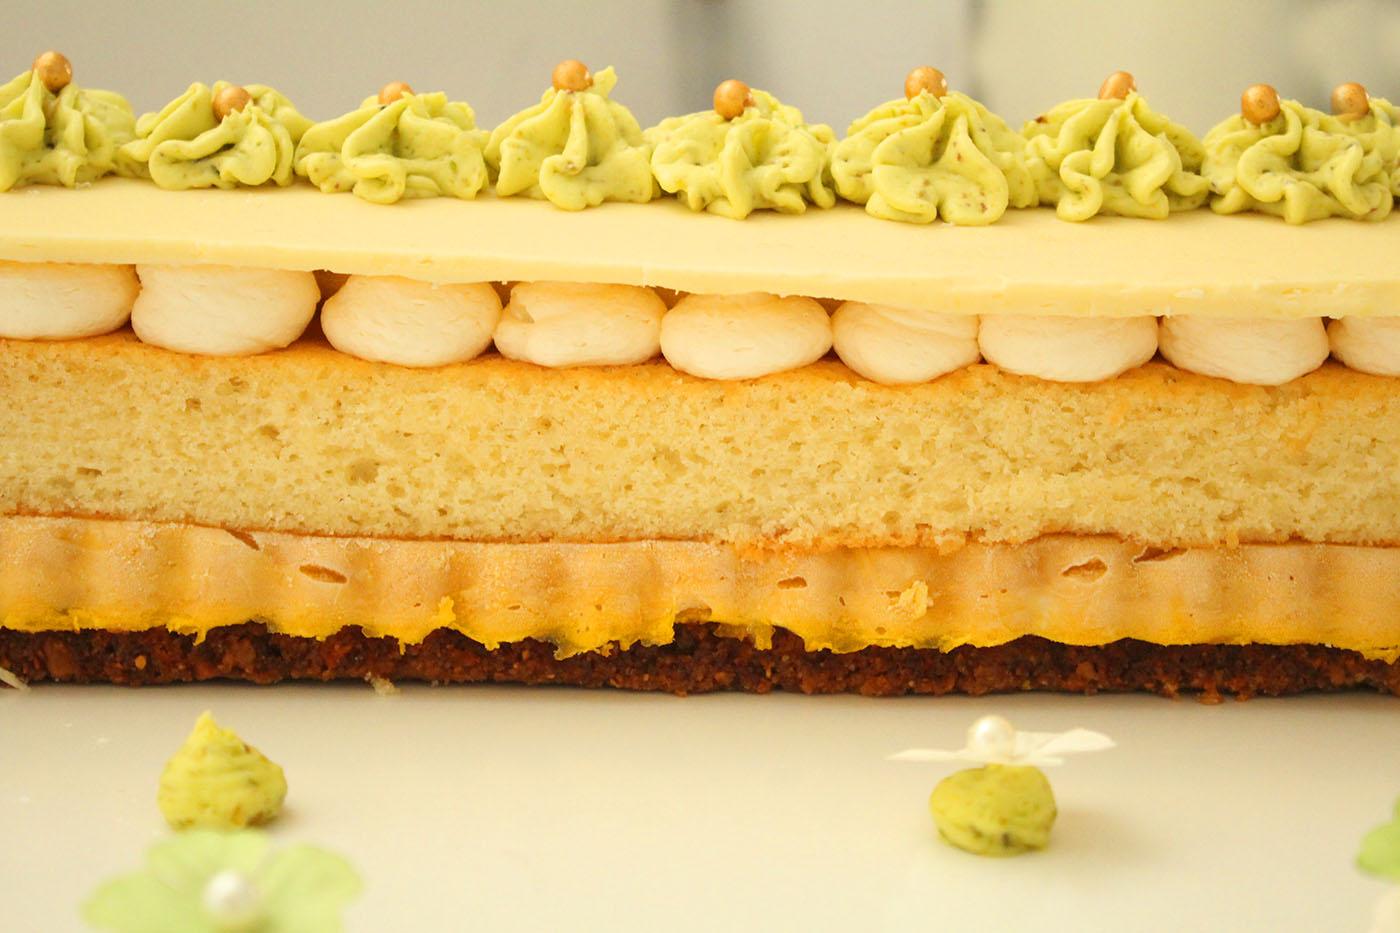 IMG 9258 - עוגת שכבות אקזותית